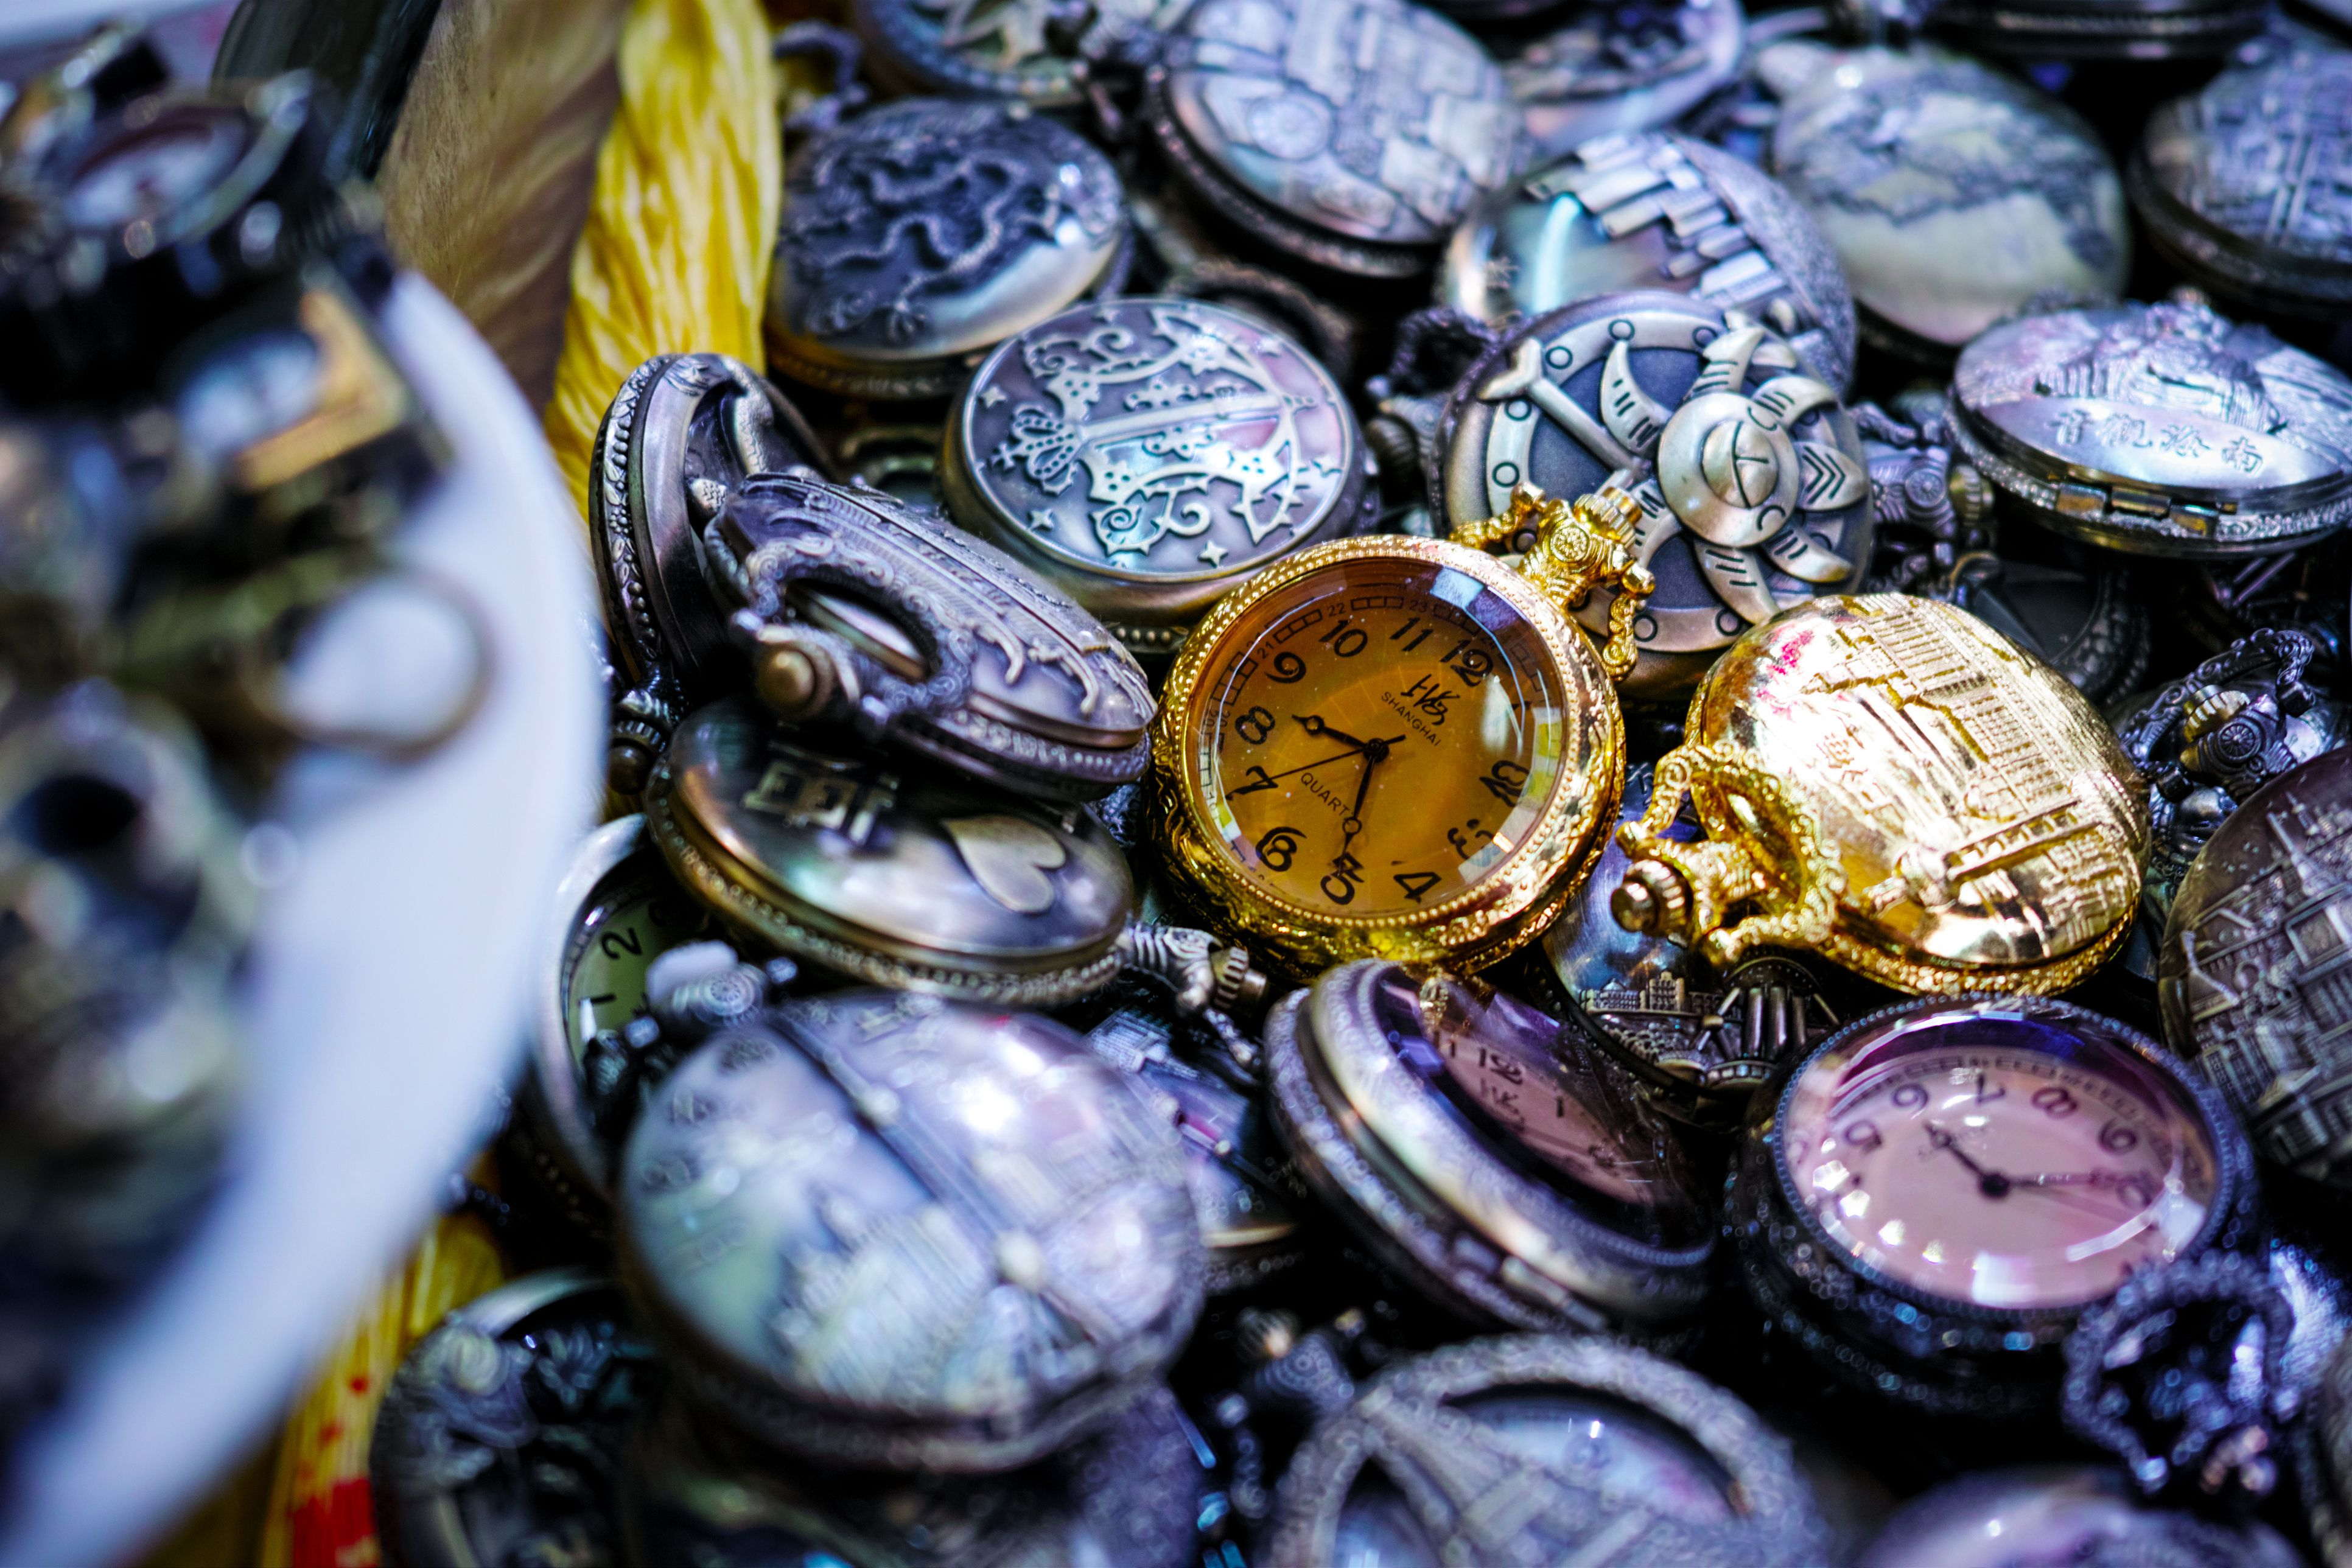 antique pocket watches, Shanghai